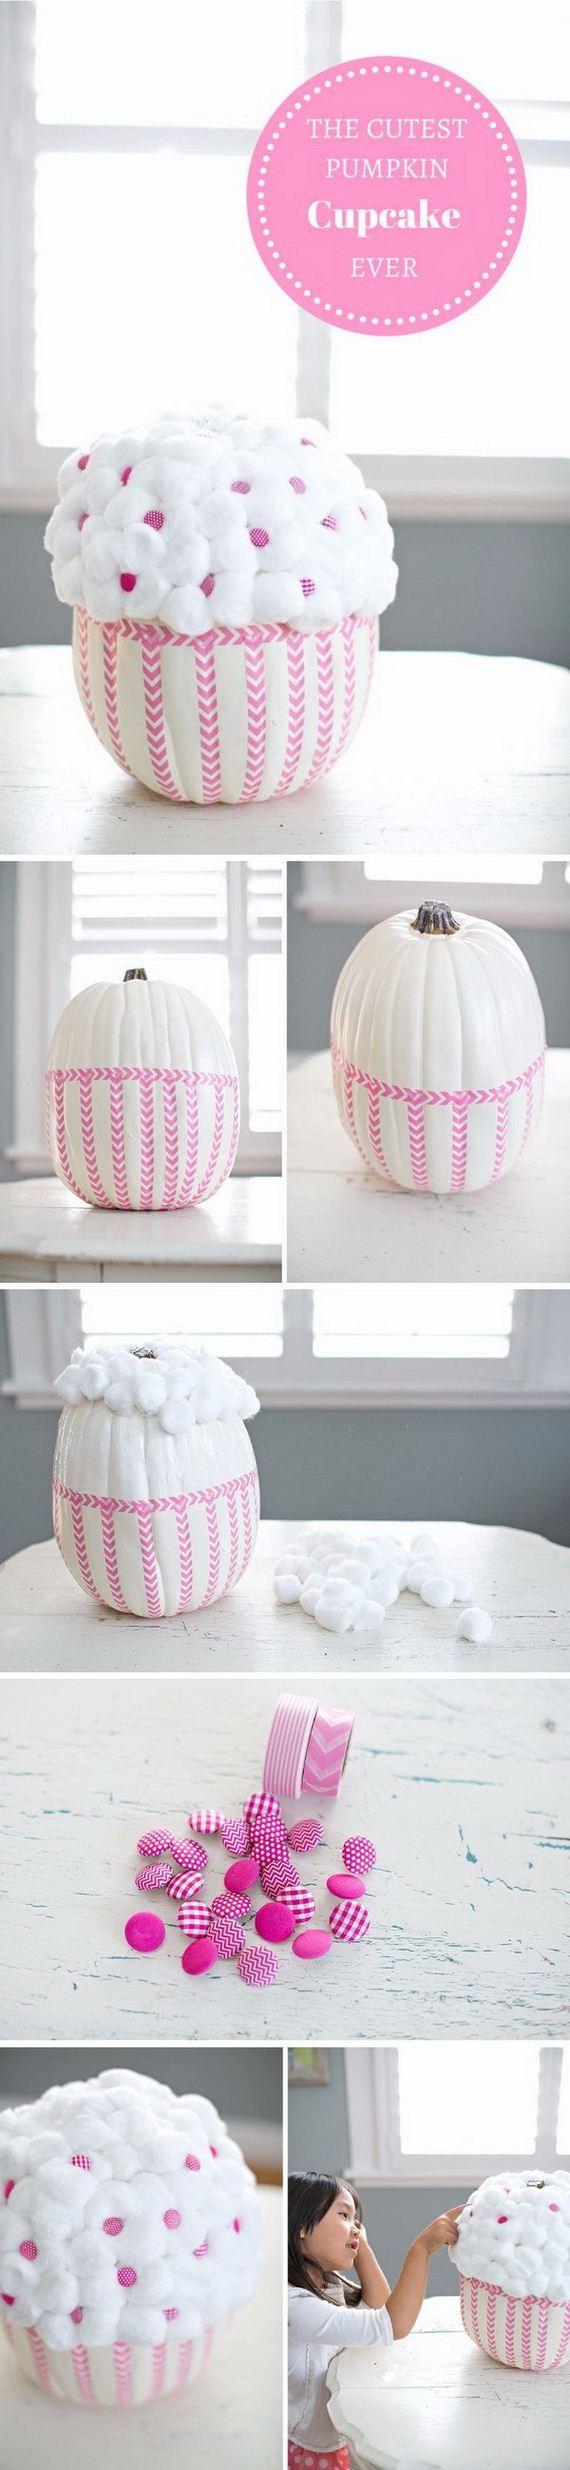 15-no-carve-pumpkin-decorating-ideas